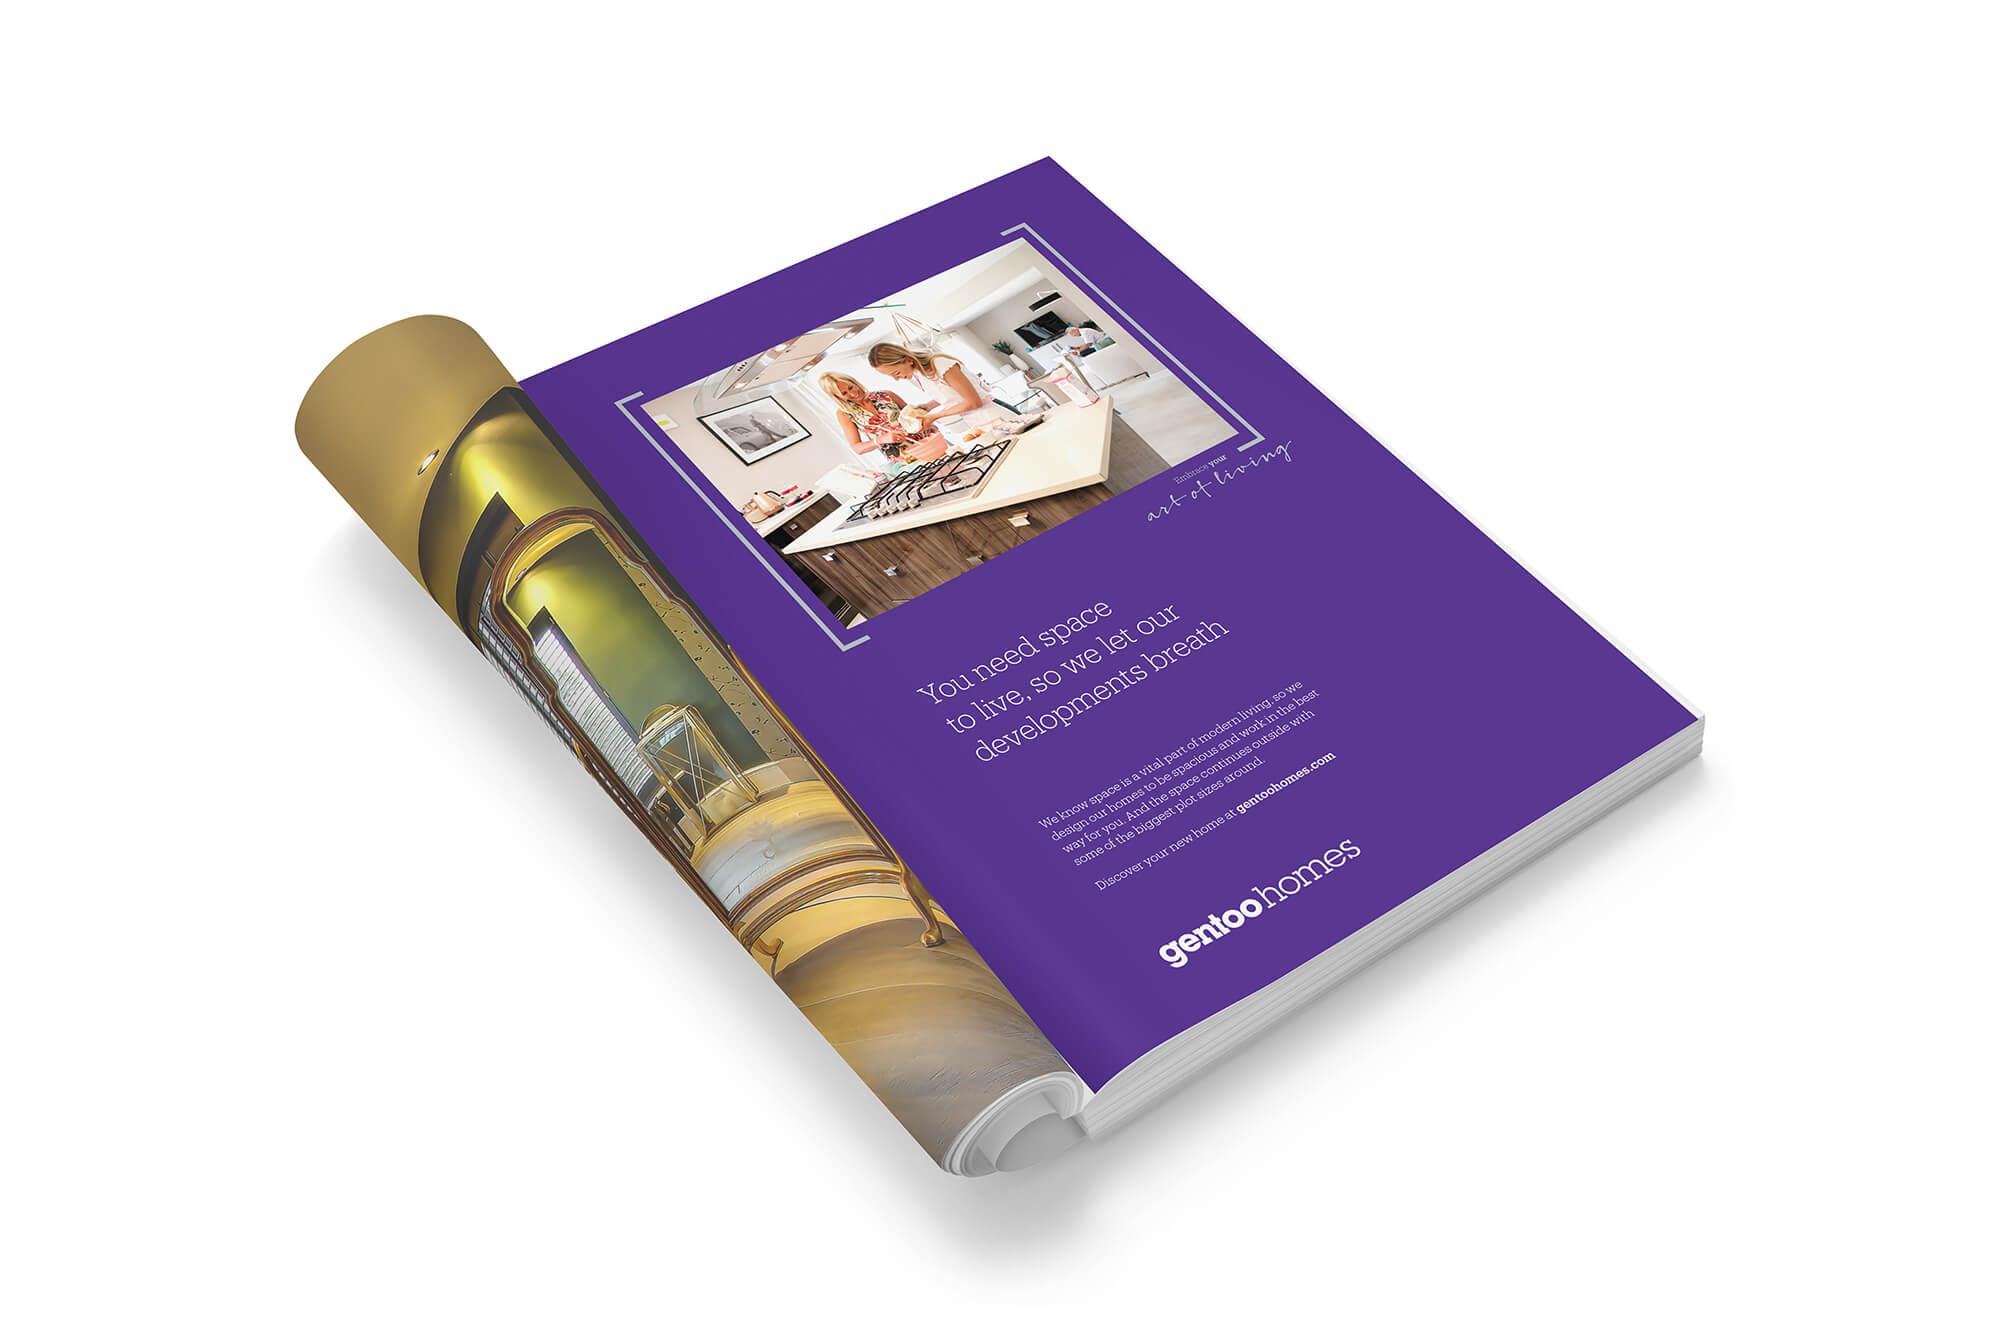 Gentoo Homes - The Works Creative, Design & Digital Agency Durham